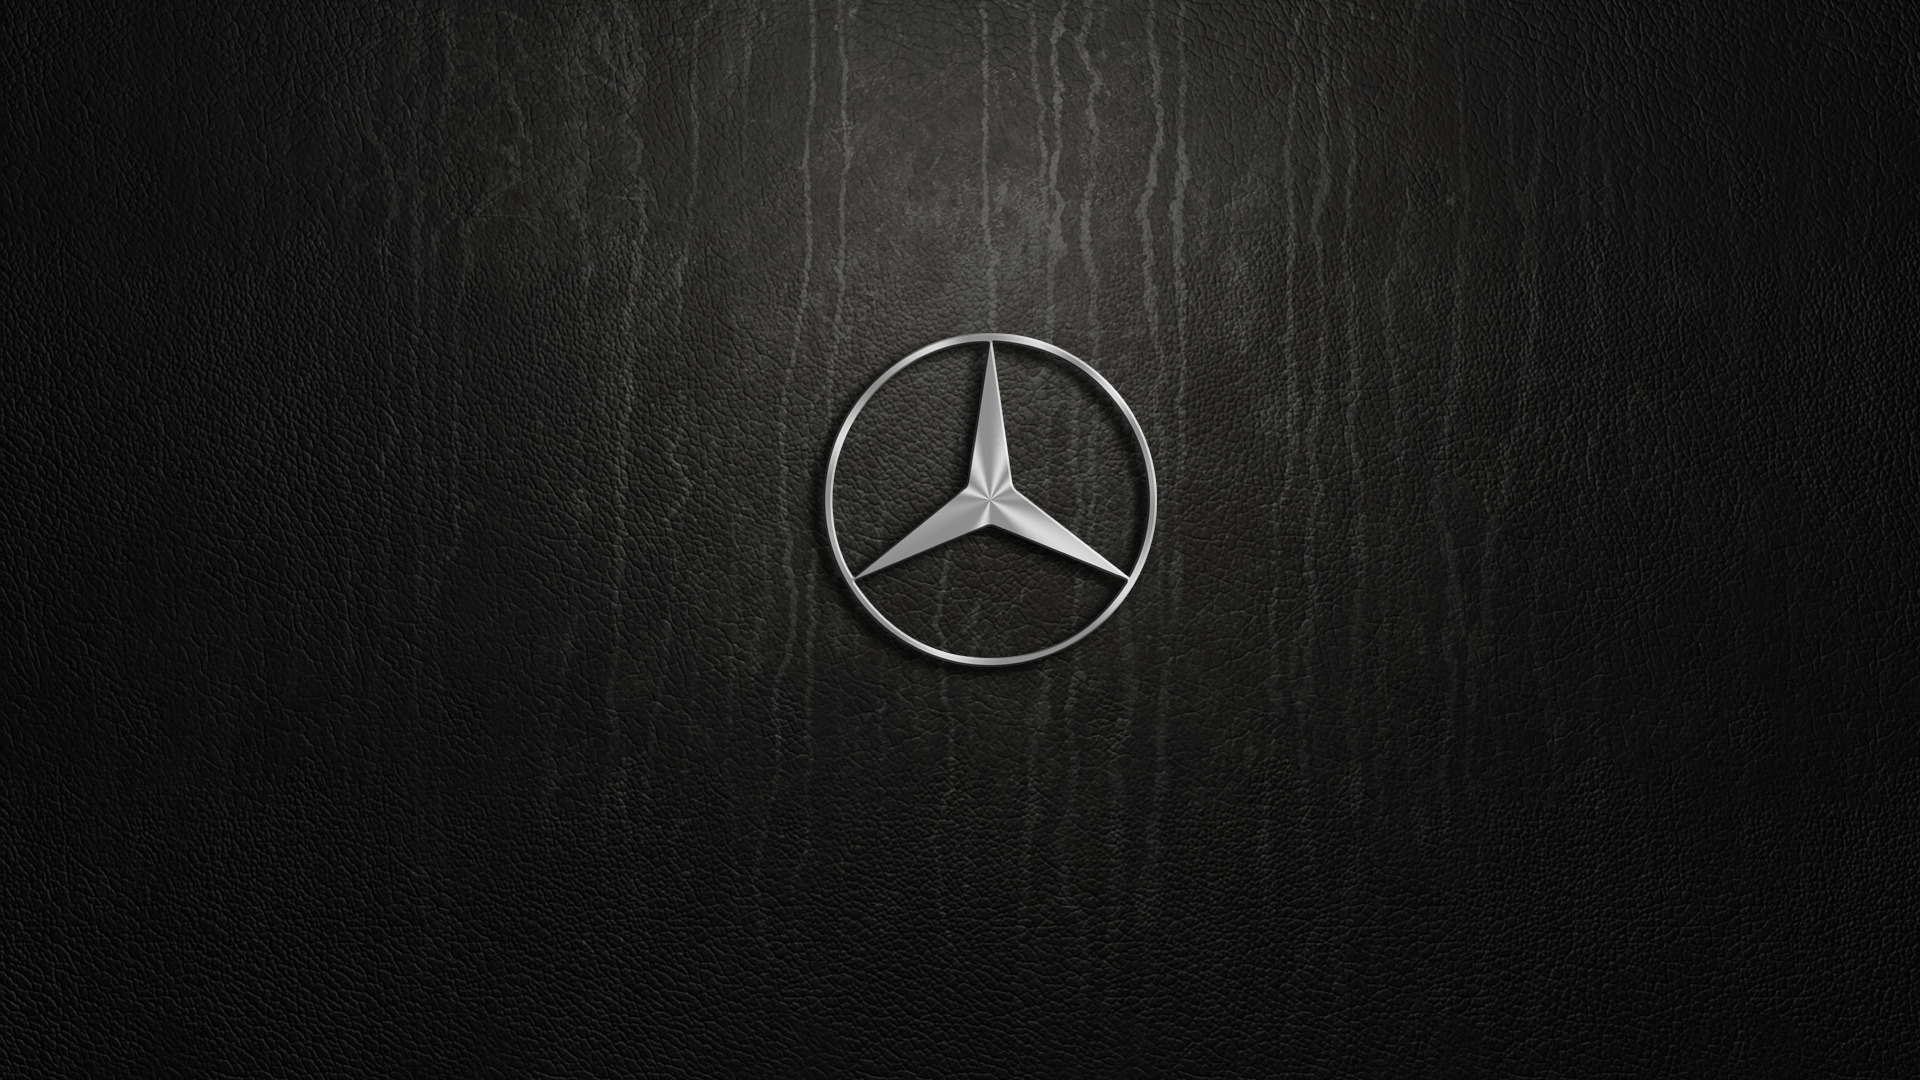 Mercedes Benz Wallpapers 1920x1080